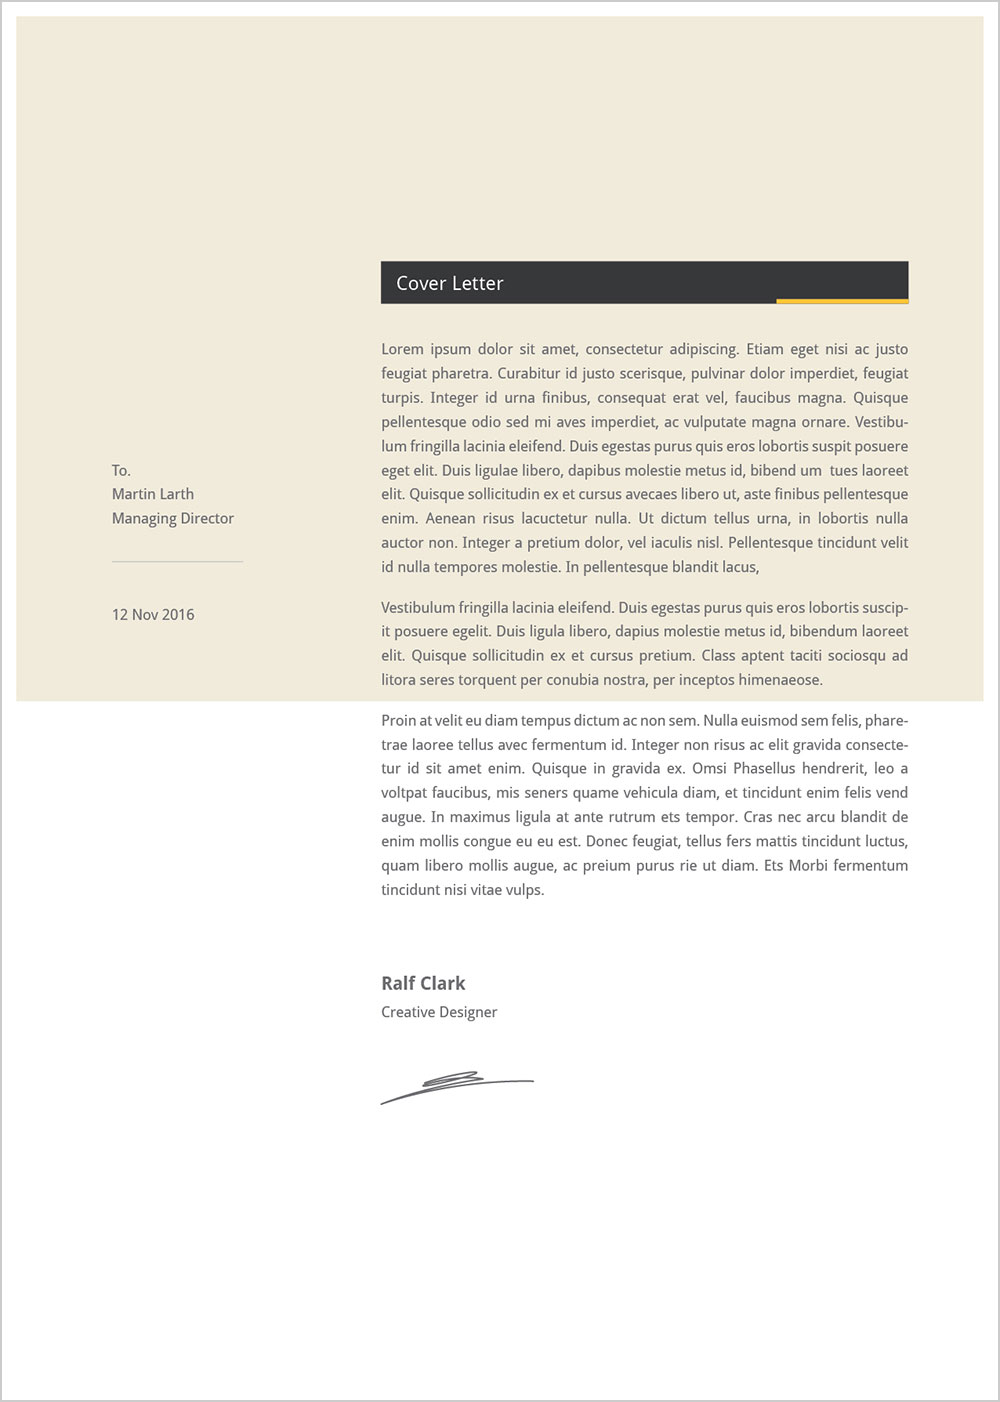 Free-Clean-Elegant-CV-Template-Ai-for-Art-Directors (5)